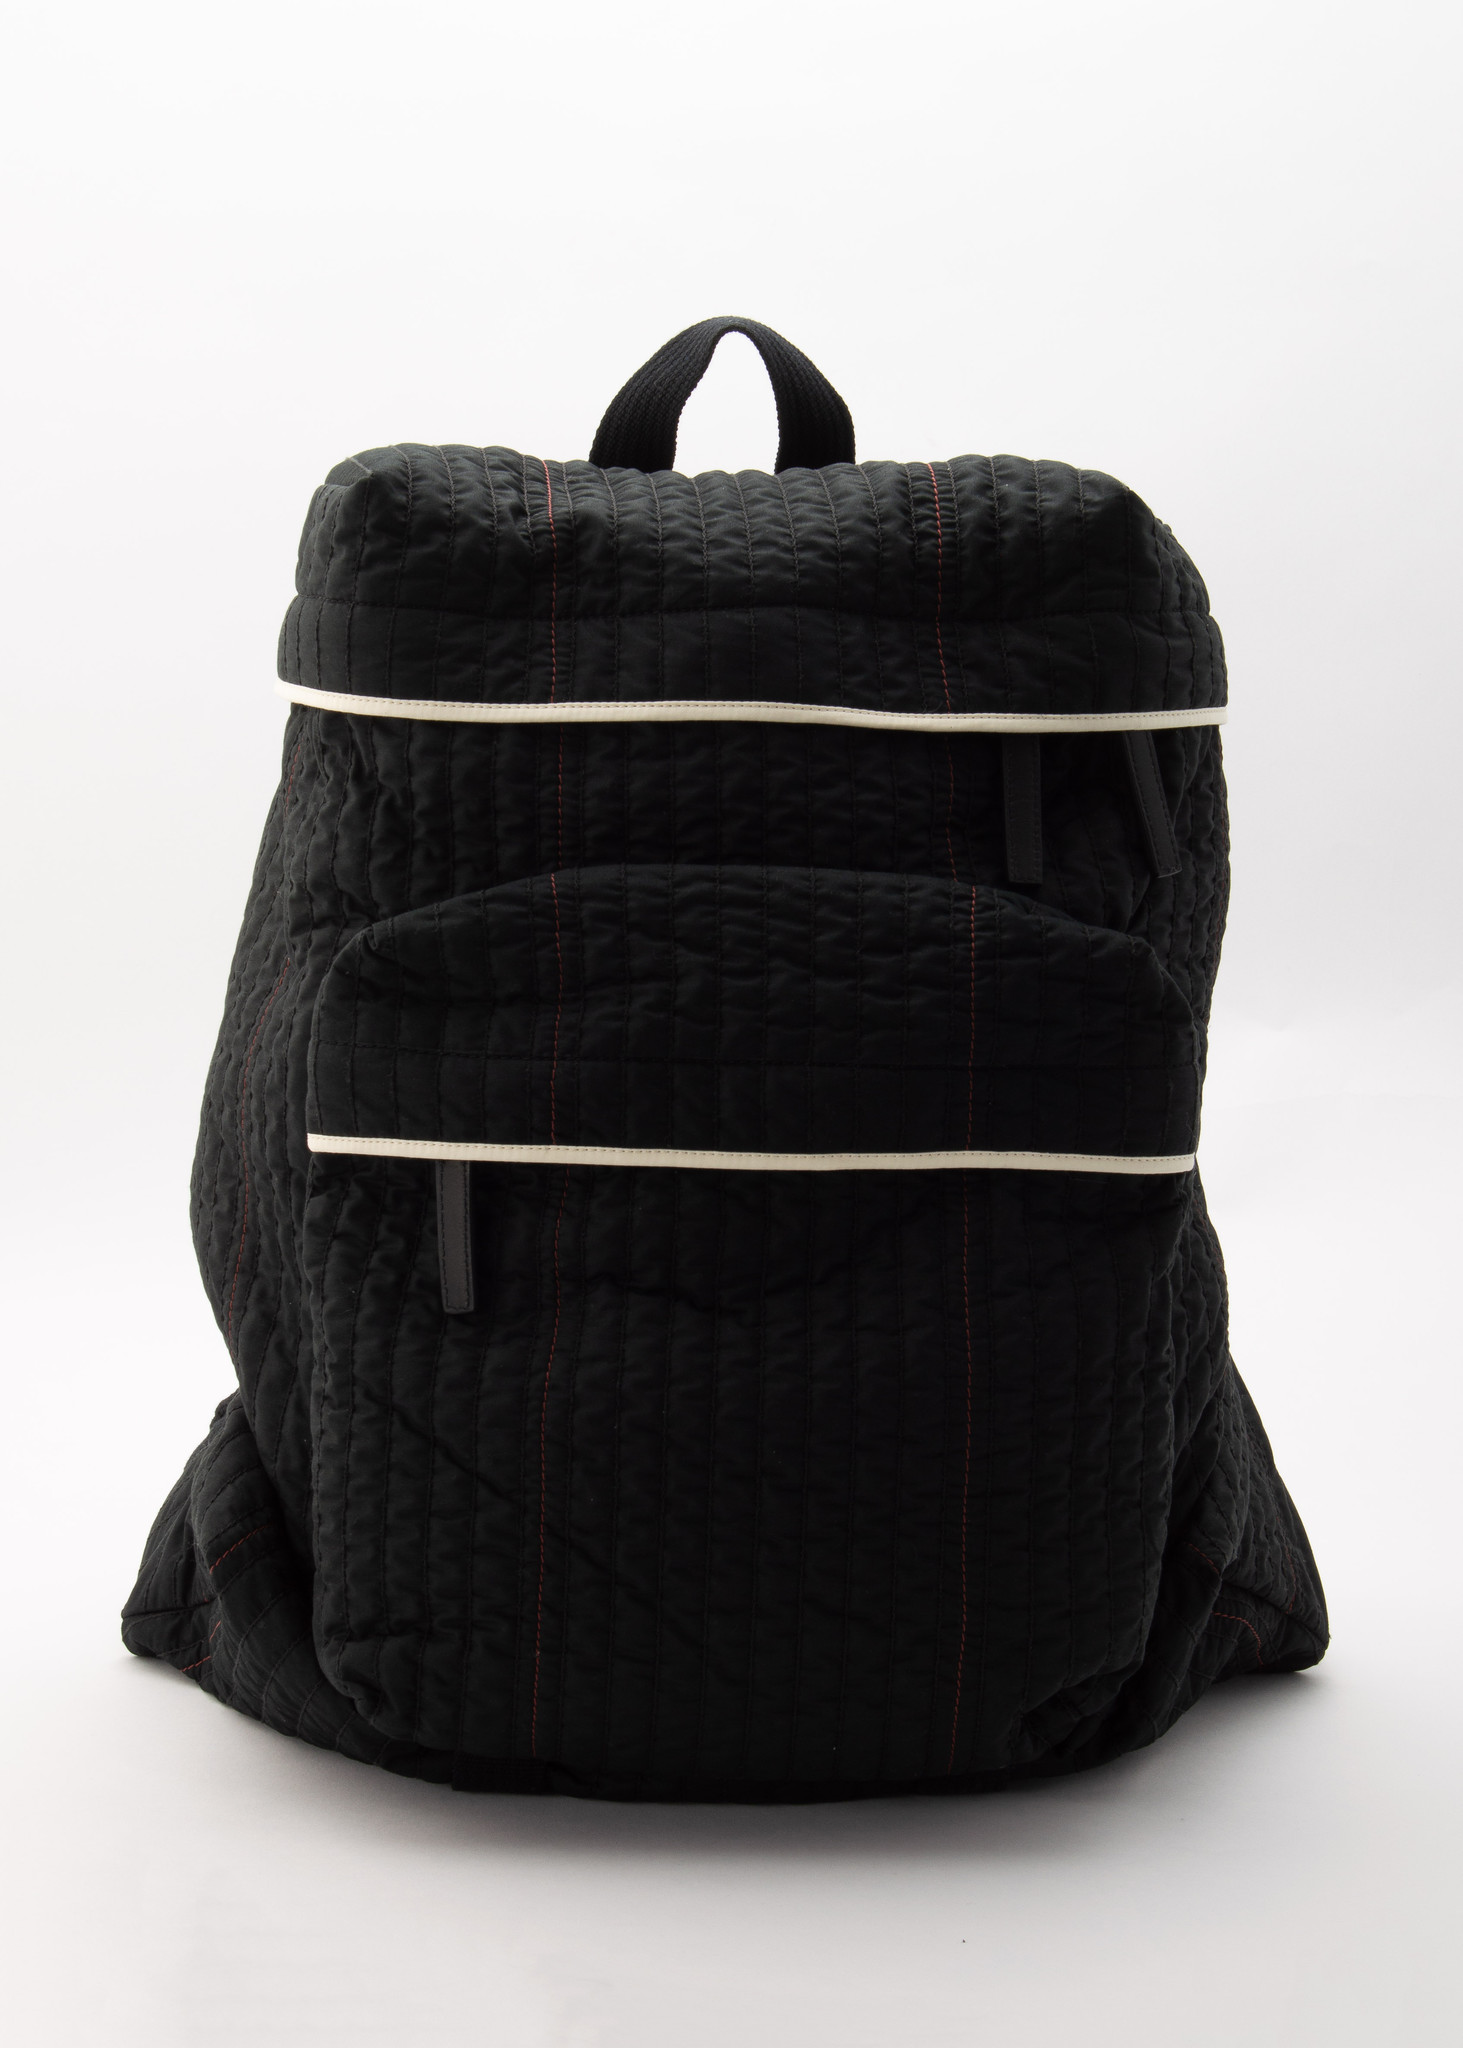 Black Temple Bag